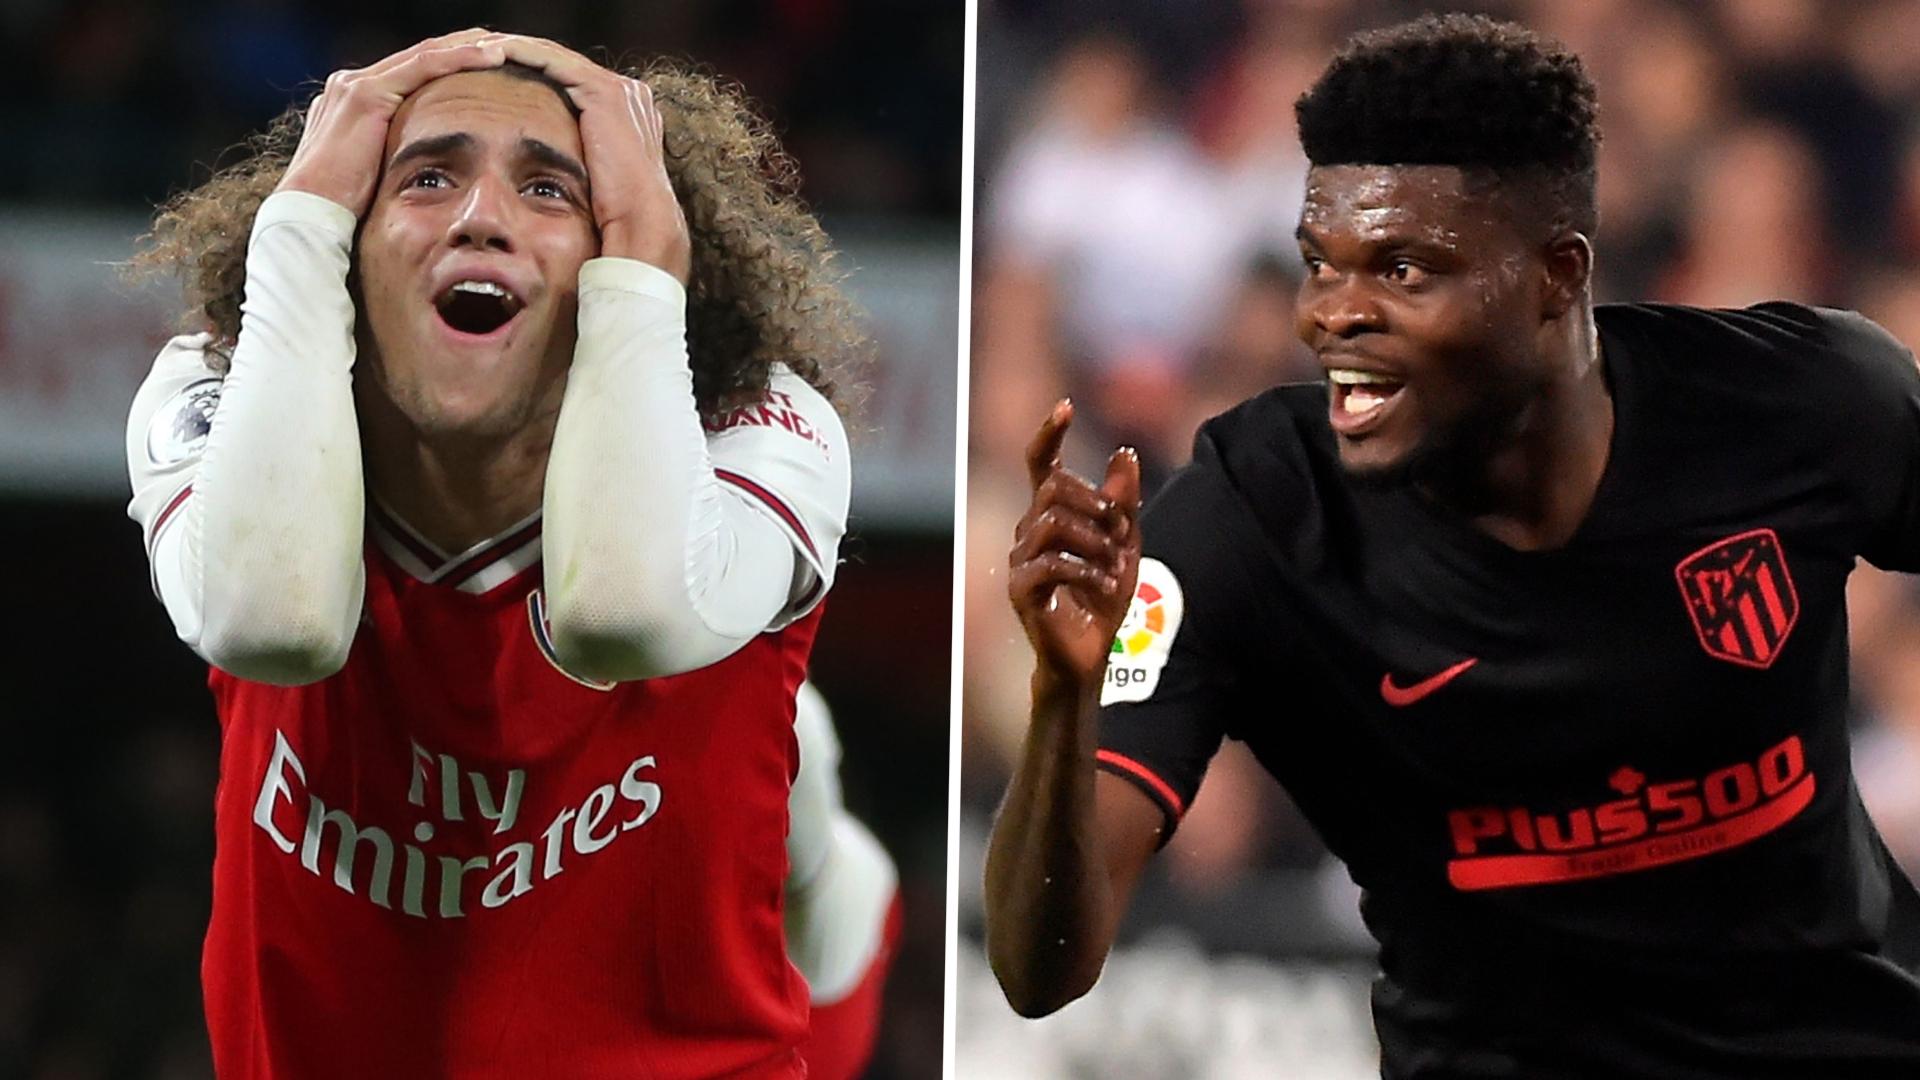 'Guendouzi out & Partey in – good window for Arsenal' – Aliadiere salutes Arteta's business